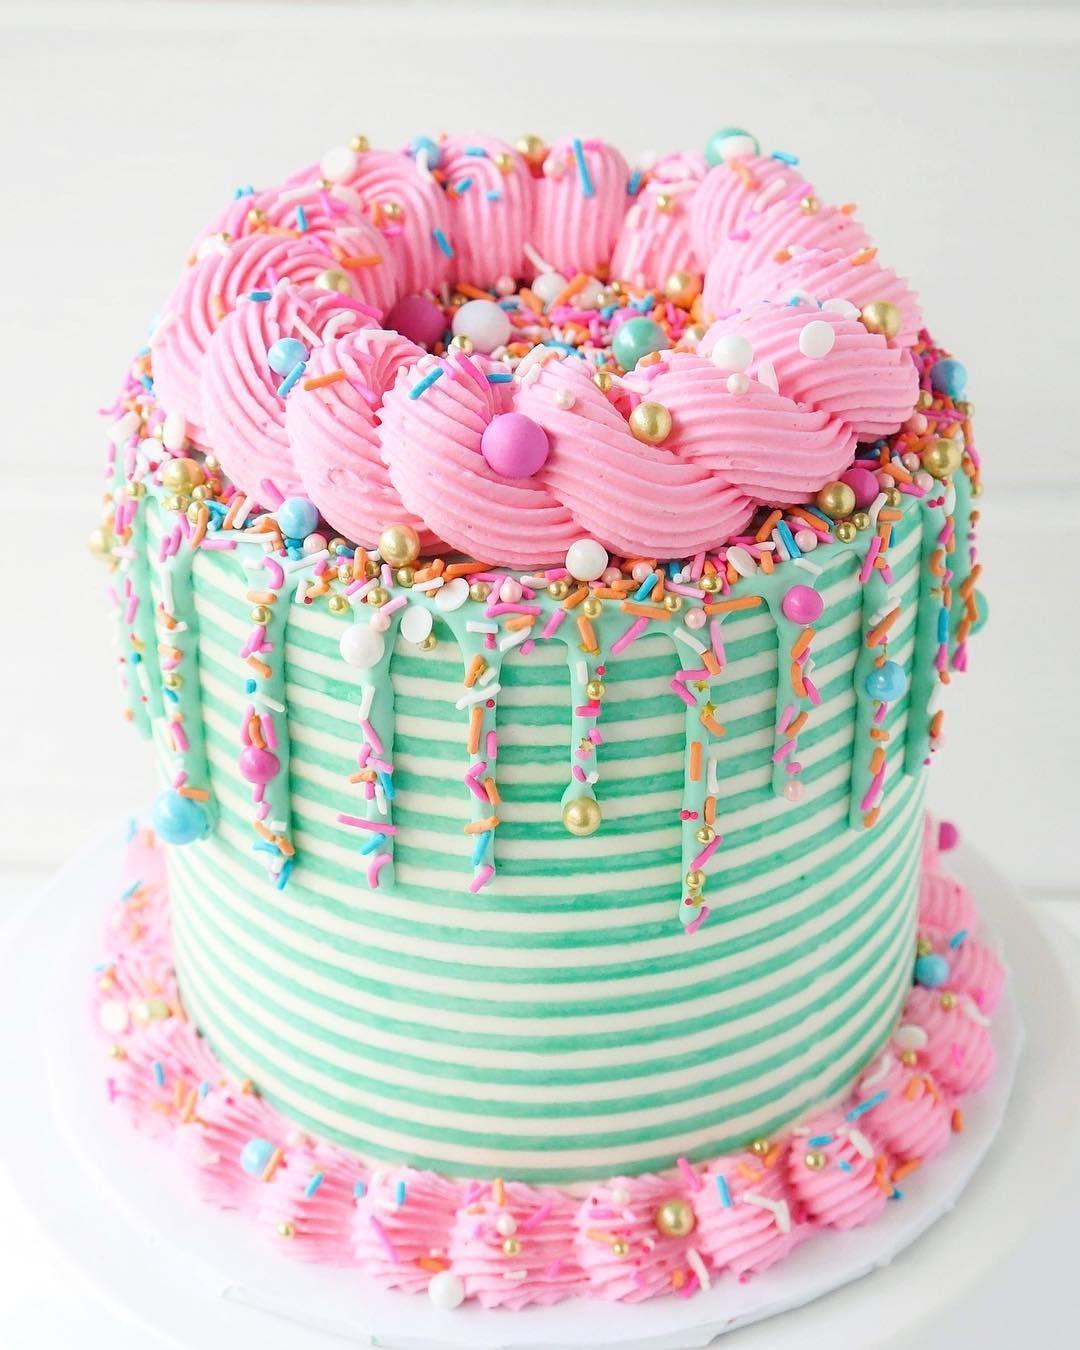 Awe Inspiring Guys This Is A Little Weird But I Made My Own Birthday Cake Funny Birthday Cards Online Inifodamsfinfo